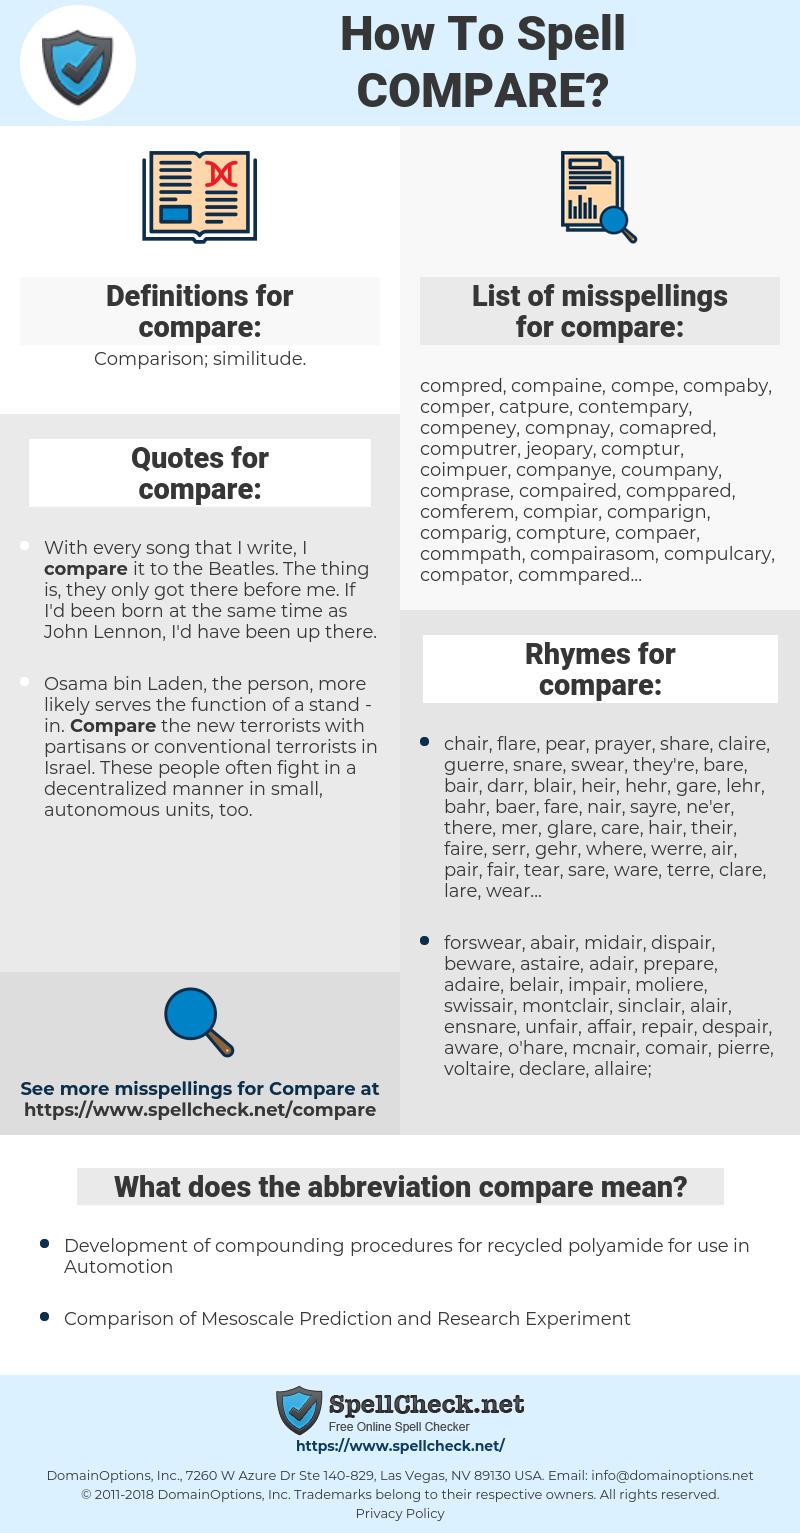 compare, spellcheck compare, how to spell compare, how do you spell compare, correct spelling for compare